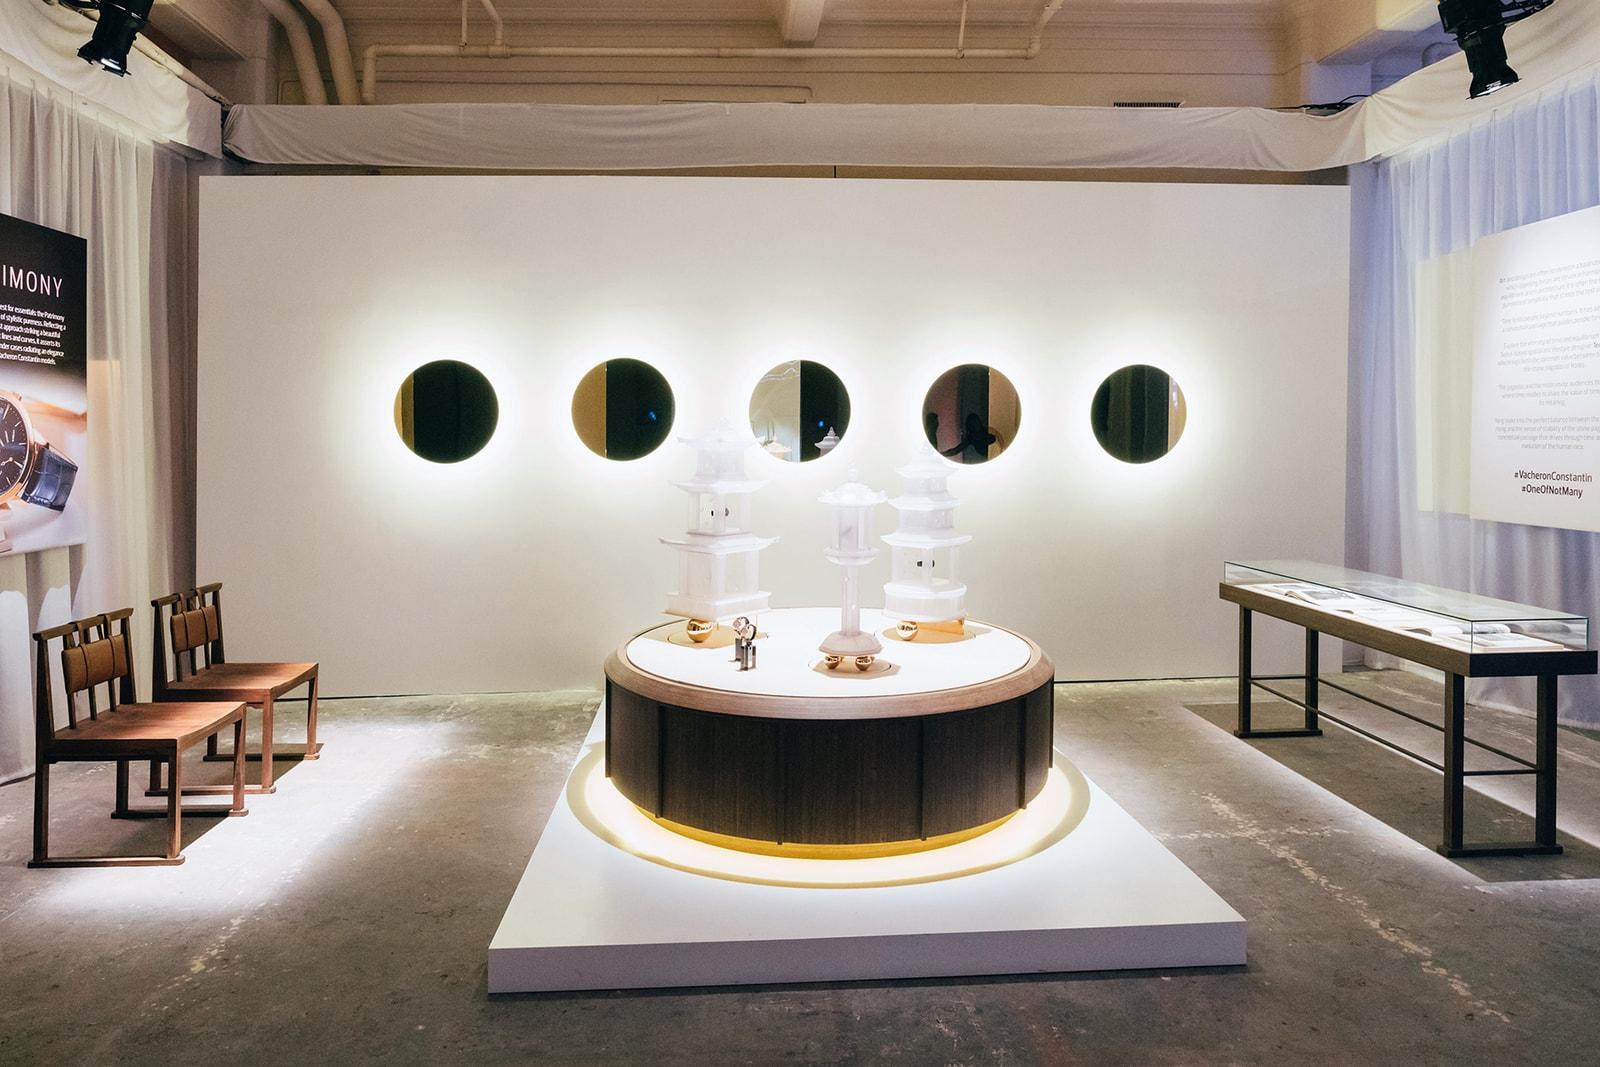 Vacheron Constantin 舉辦「One of Not Many」鐘錶展覽及酒會派對